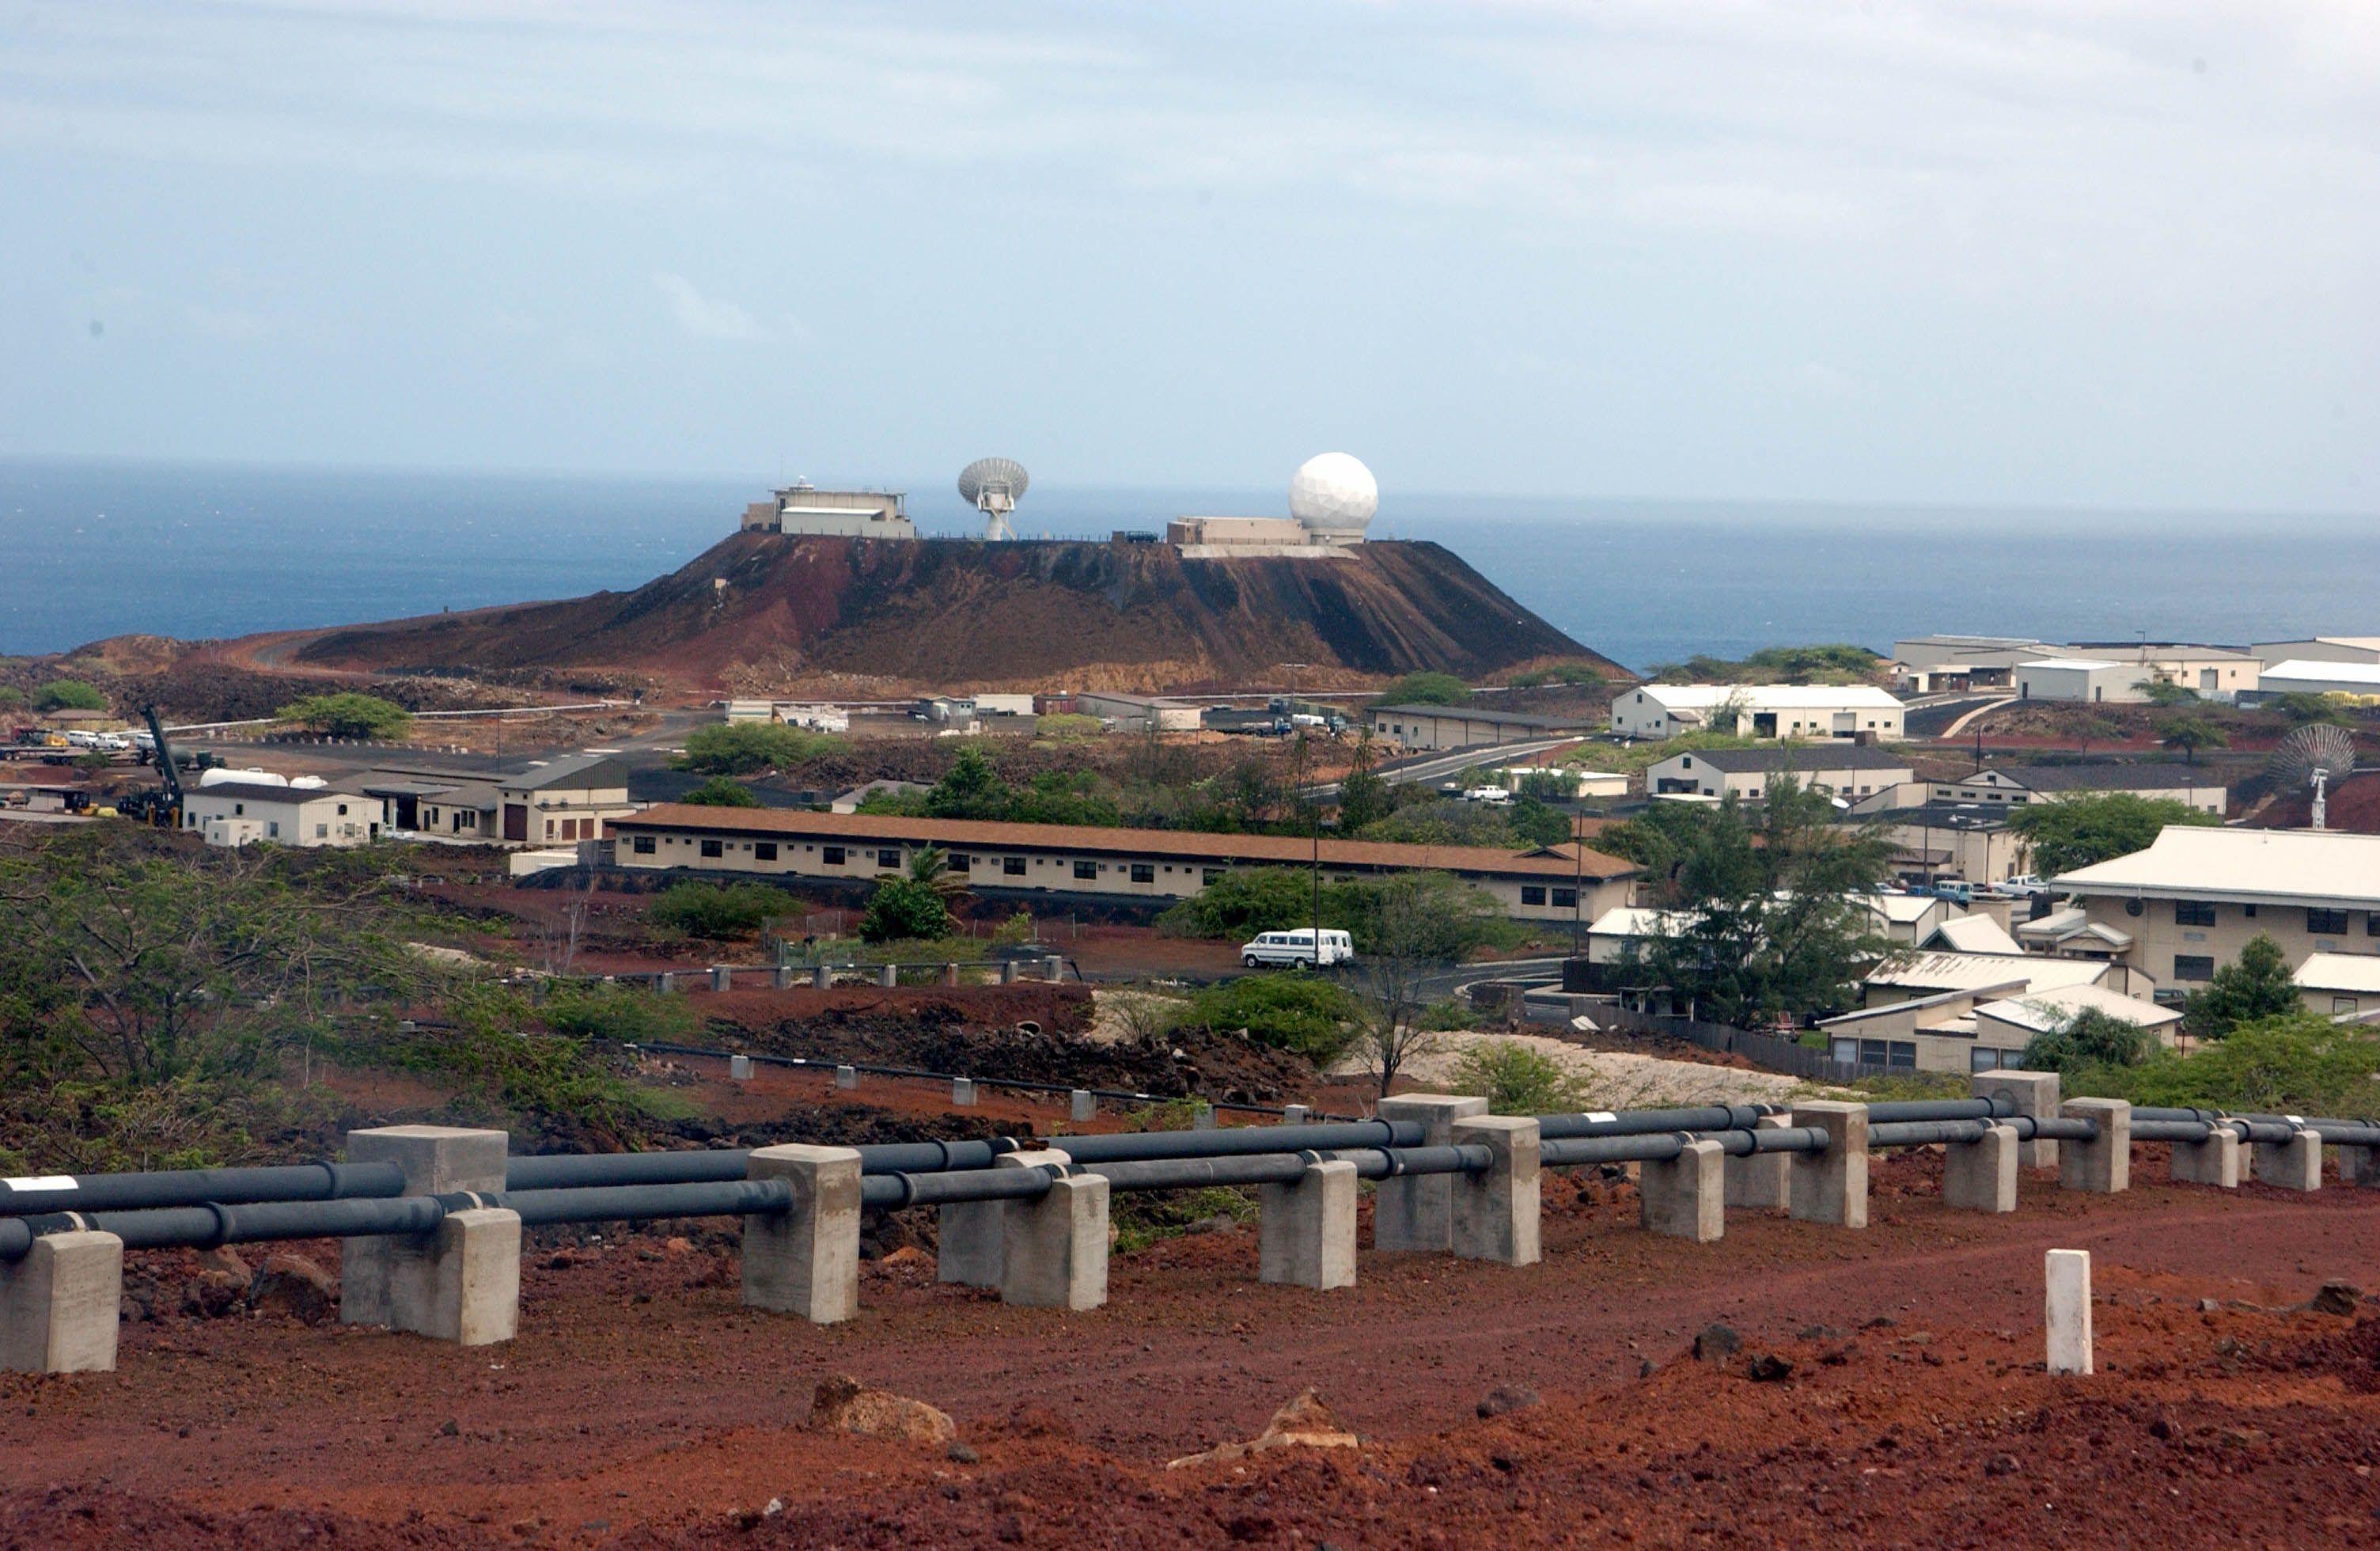 Cat Hill Ascension Island Ascension Pinterest - Ascension island google map